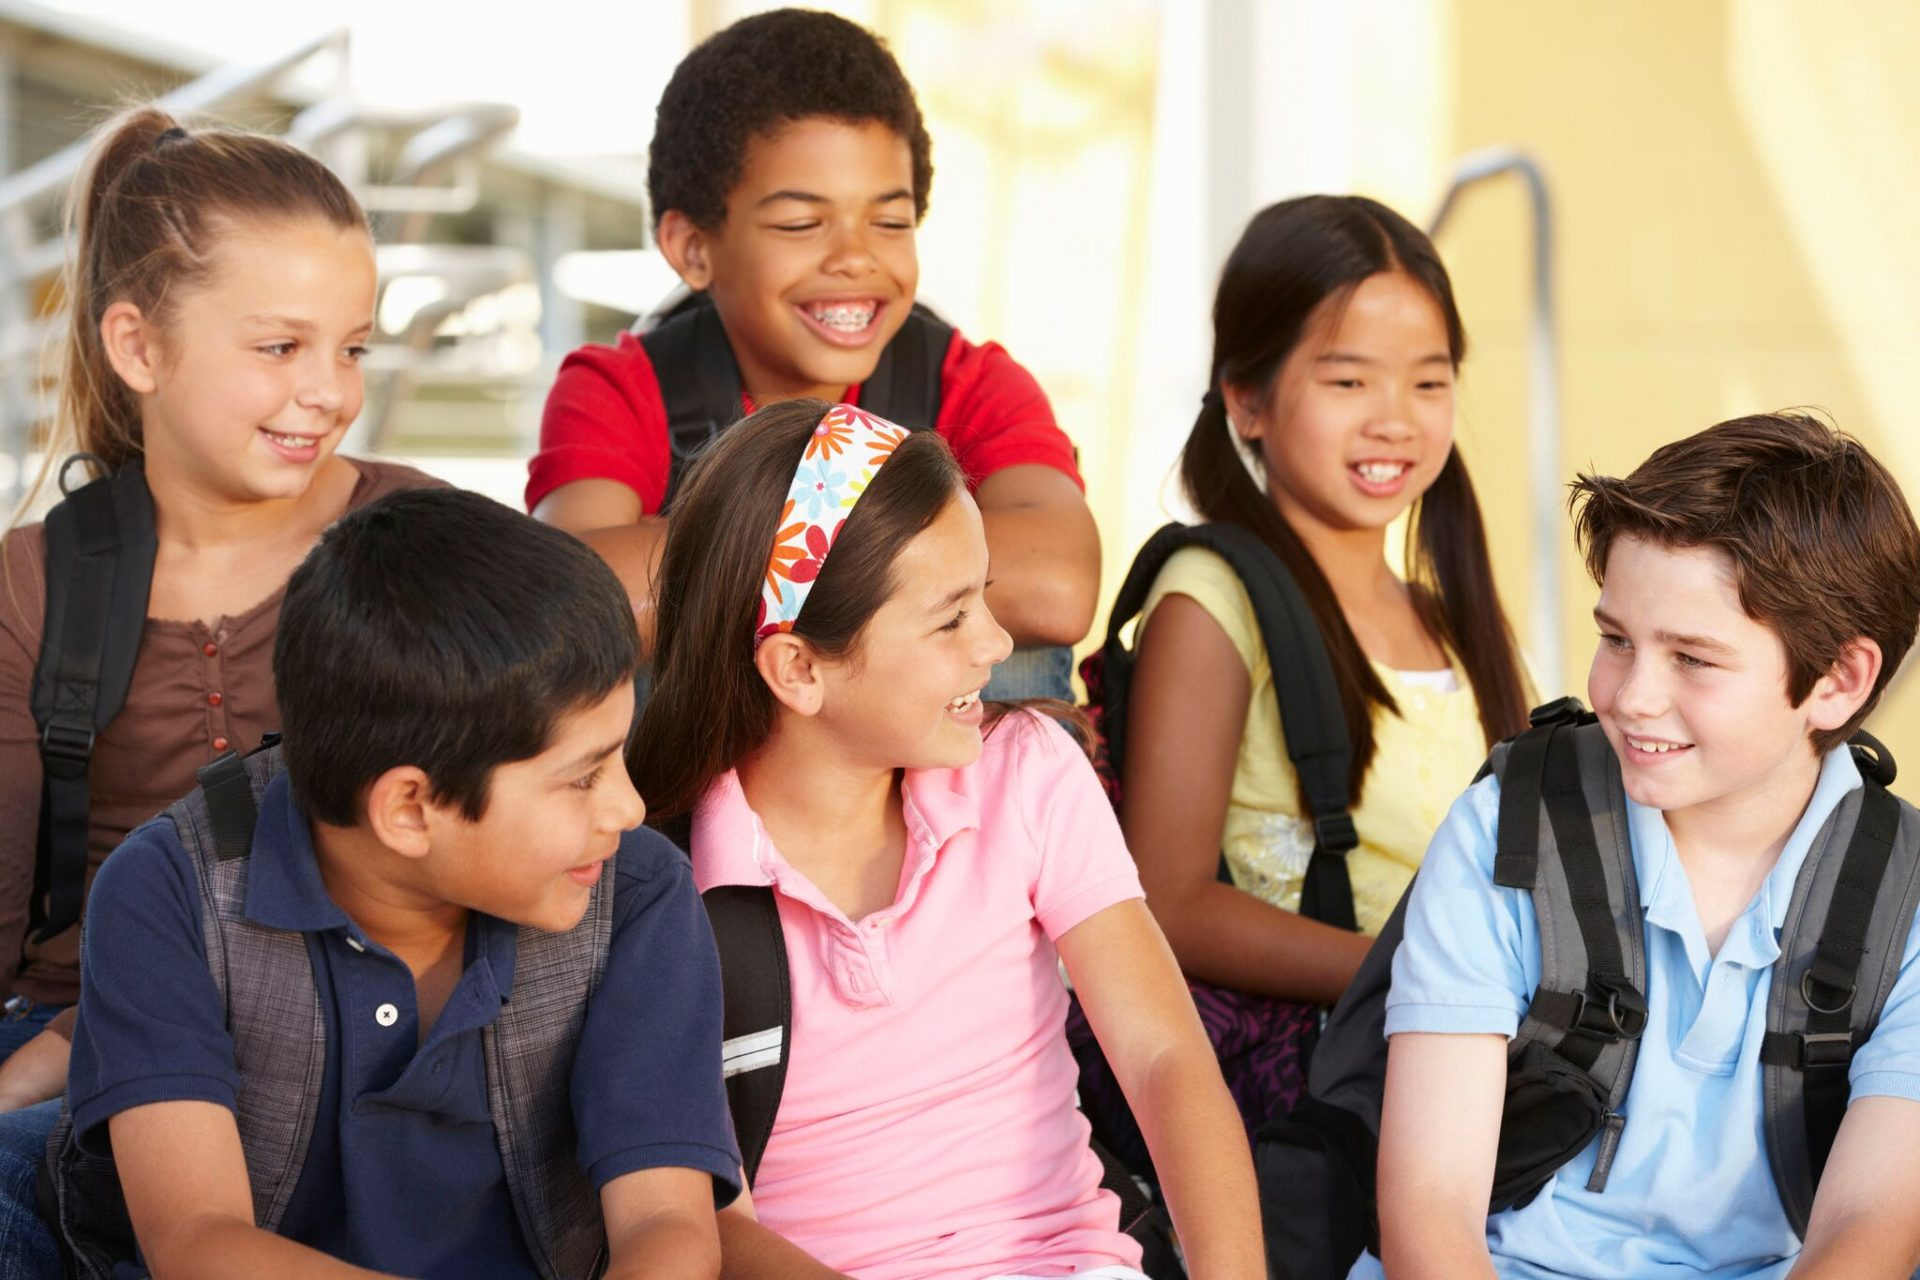 kids at school image